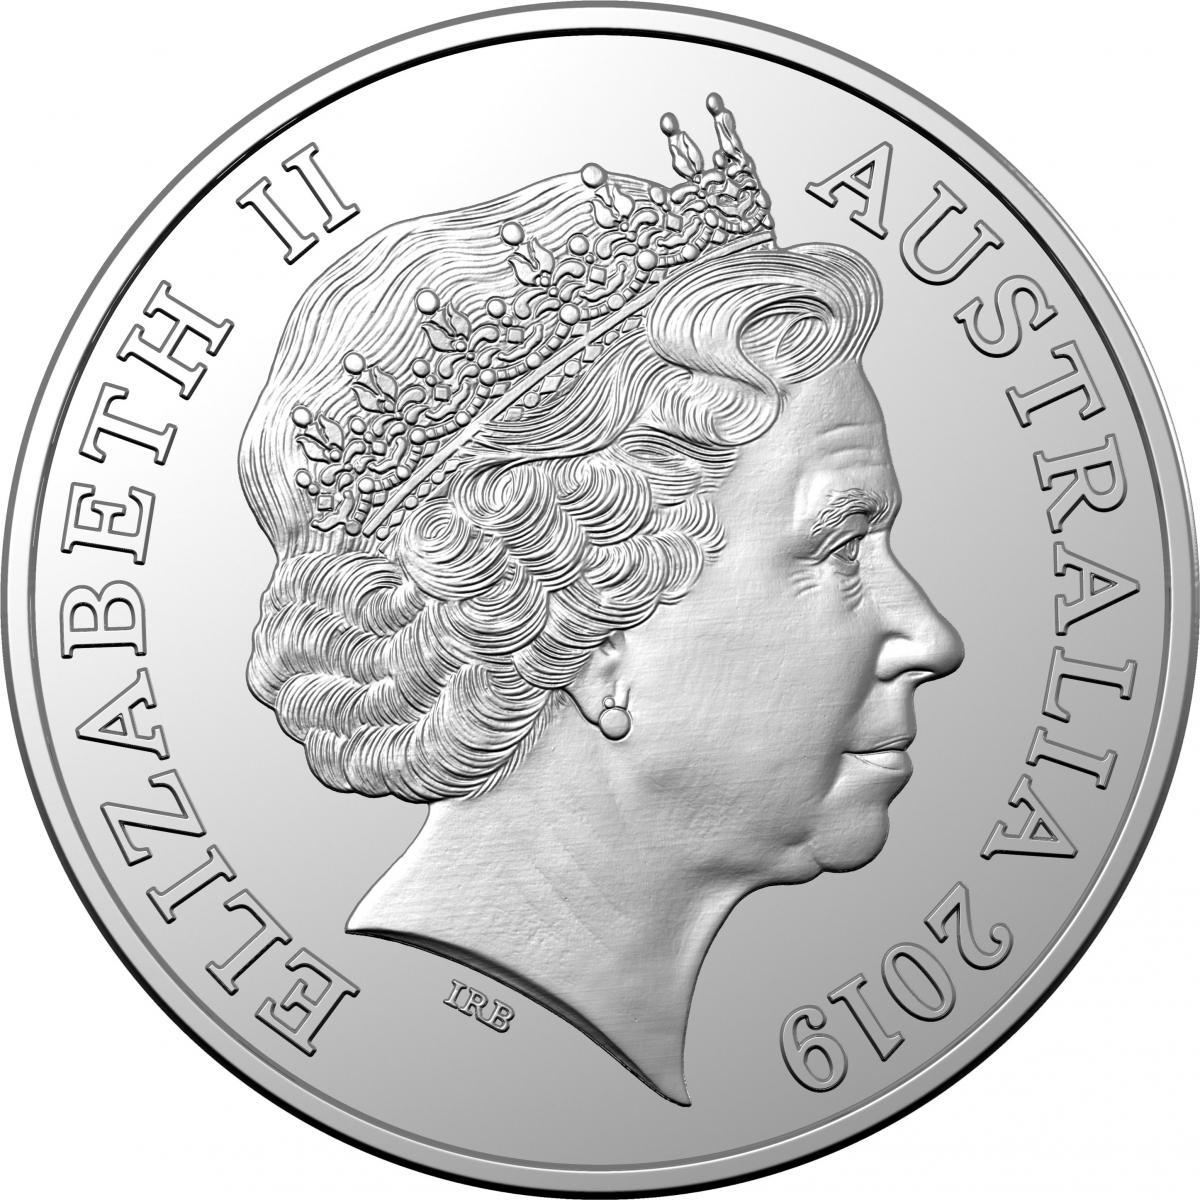 Investment Coins | Royal Australian Mint